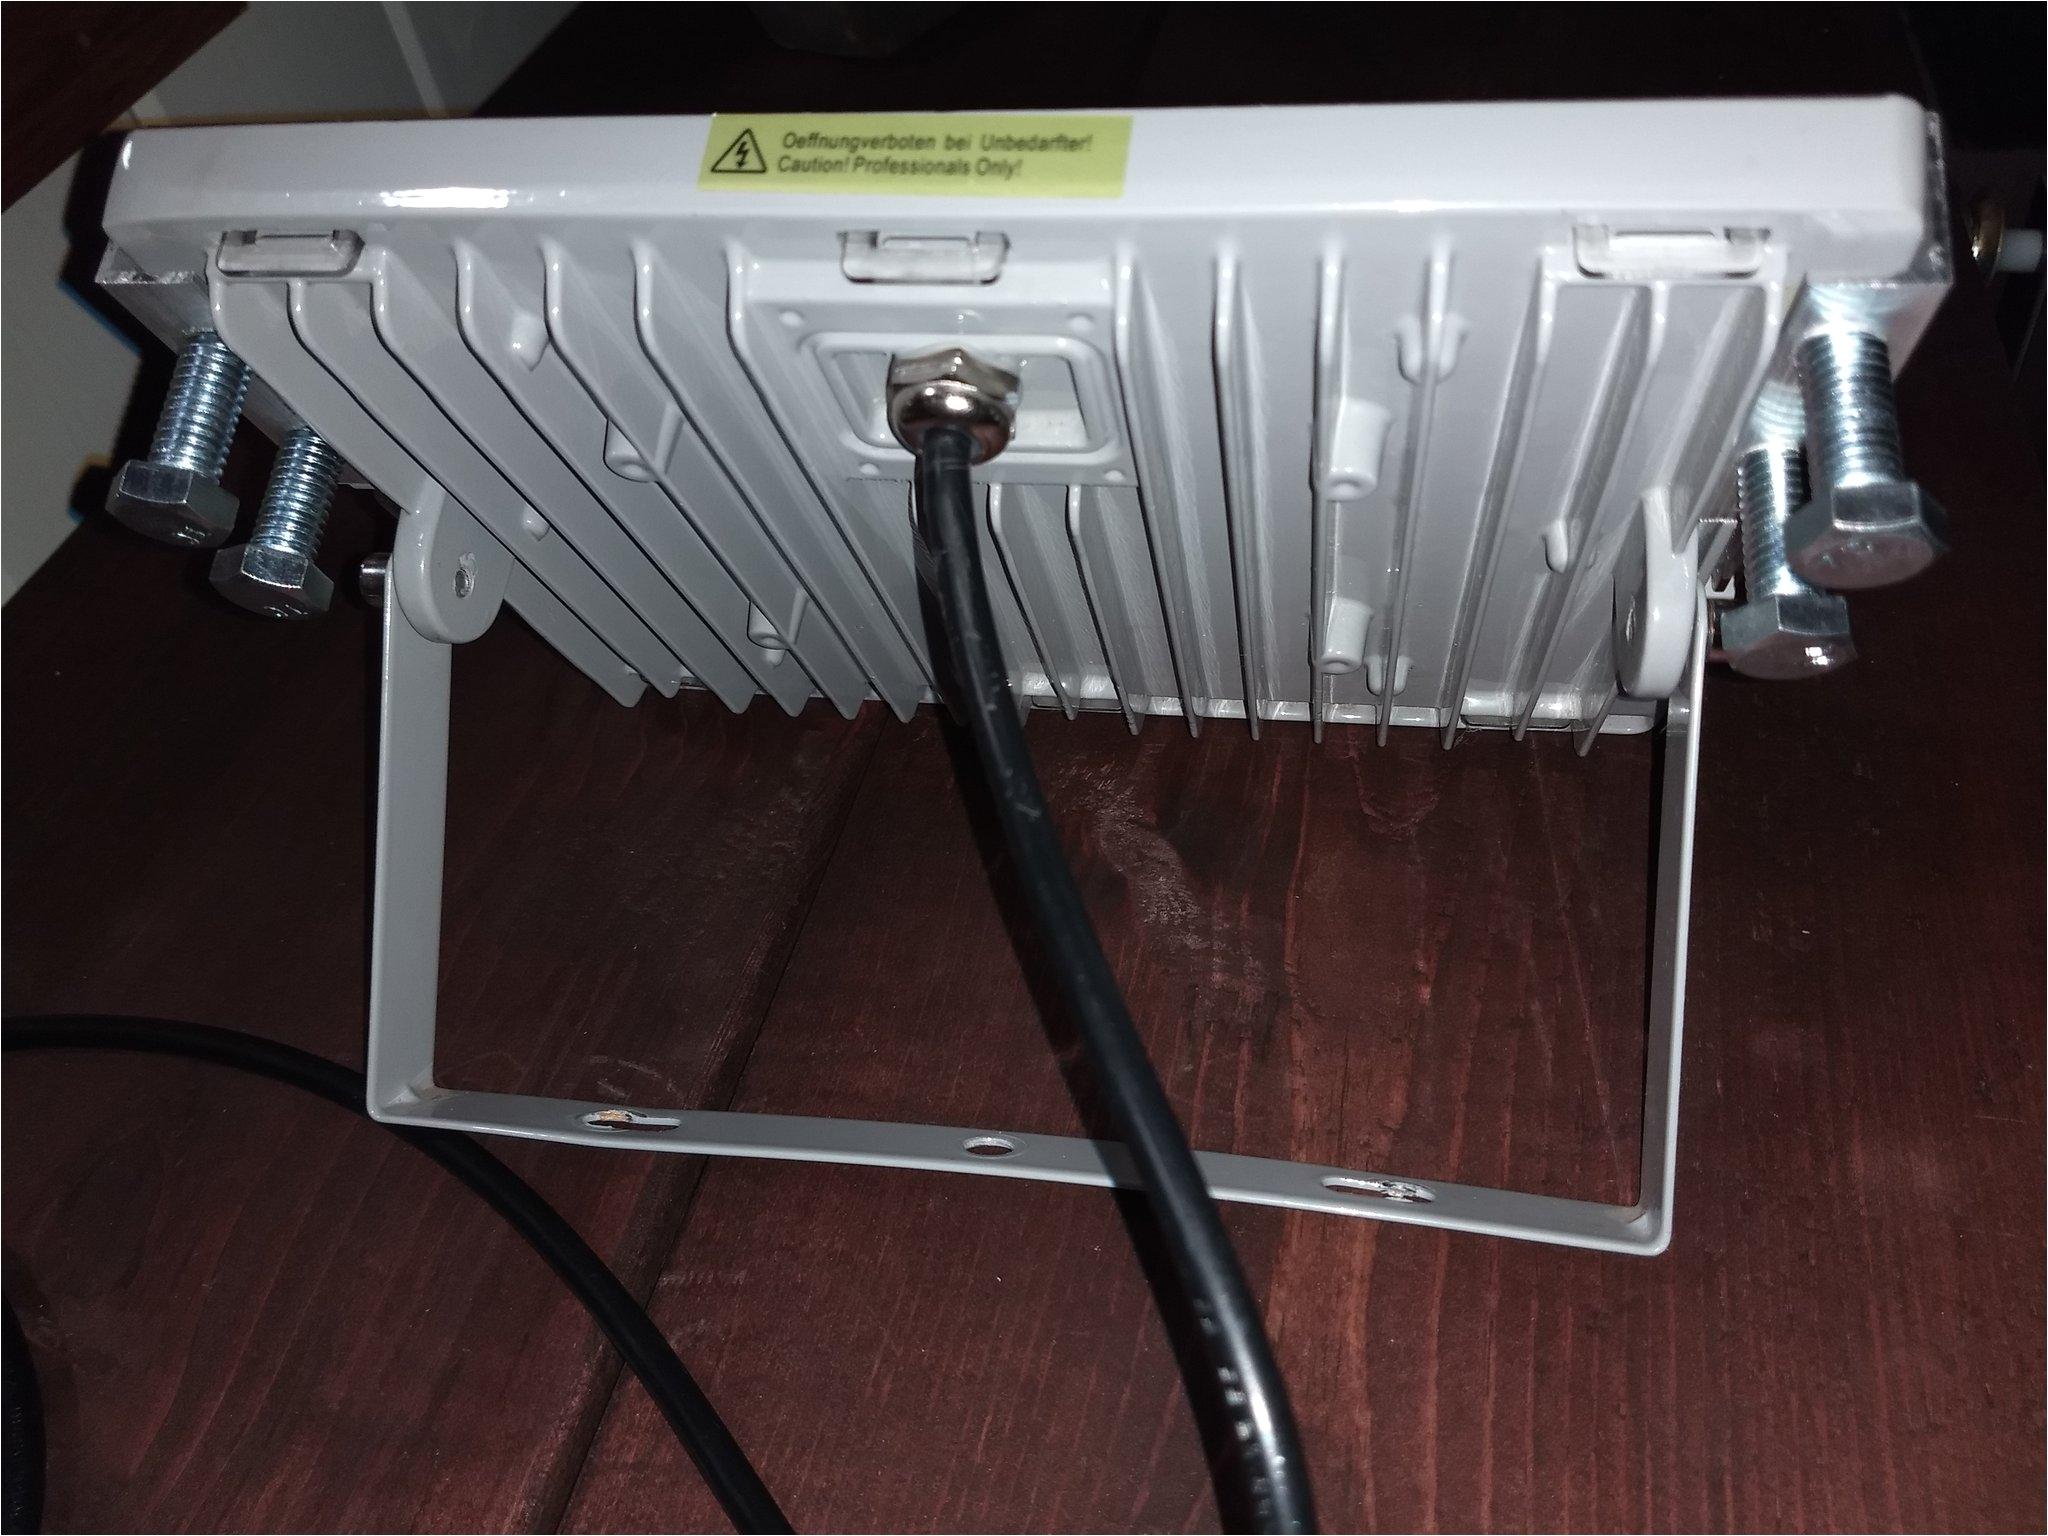 next generation leds 100w led bowfishing flood light 110v ac hps amber filter